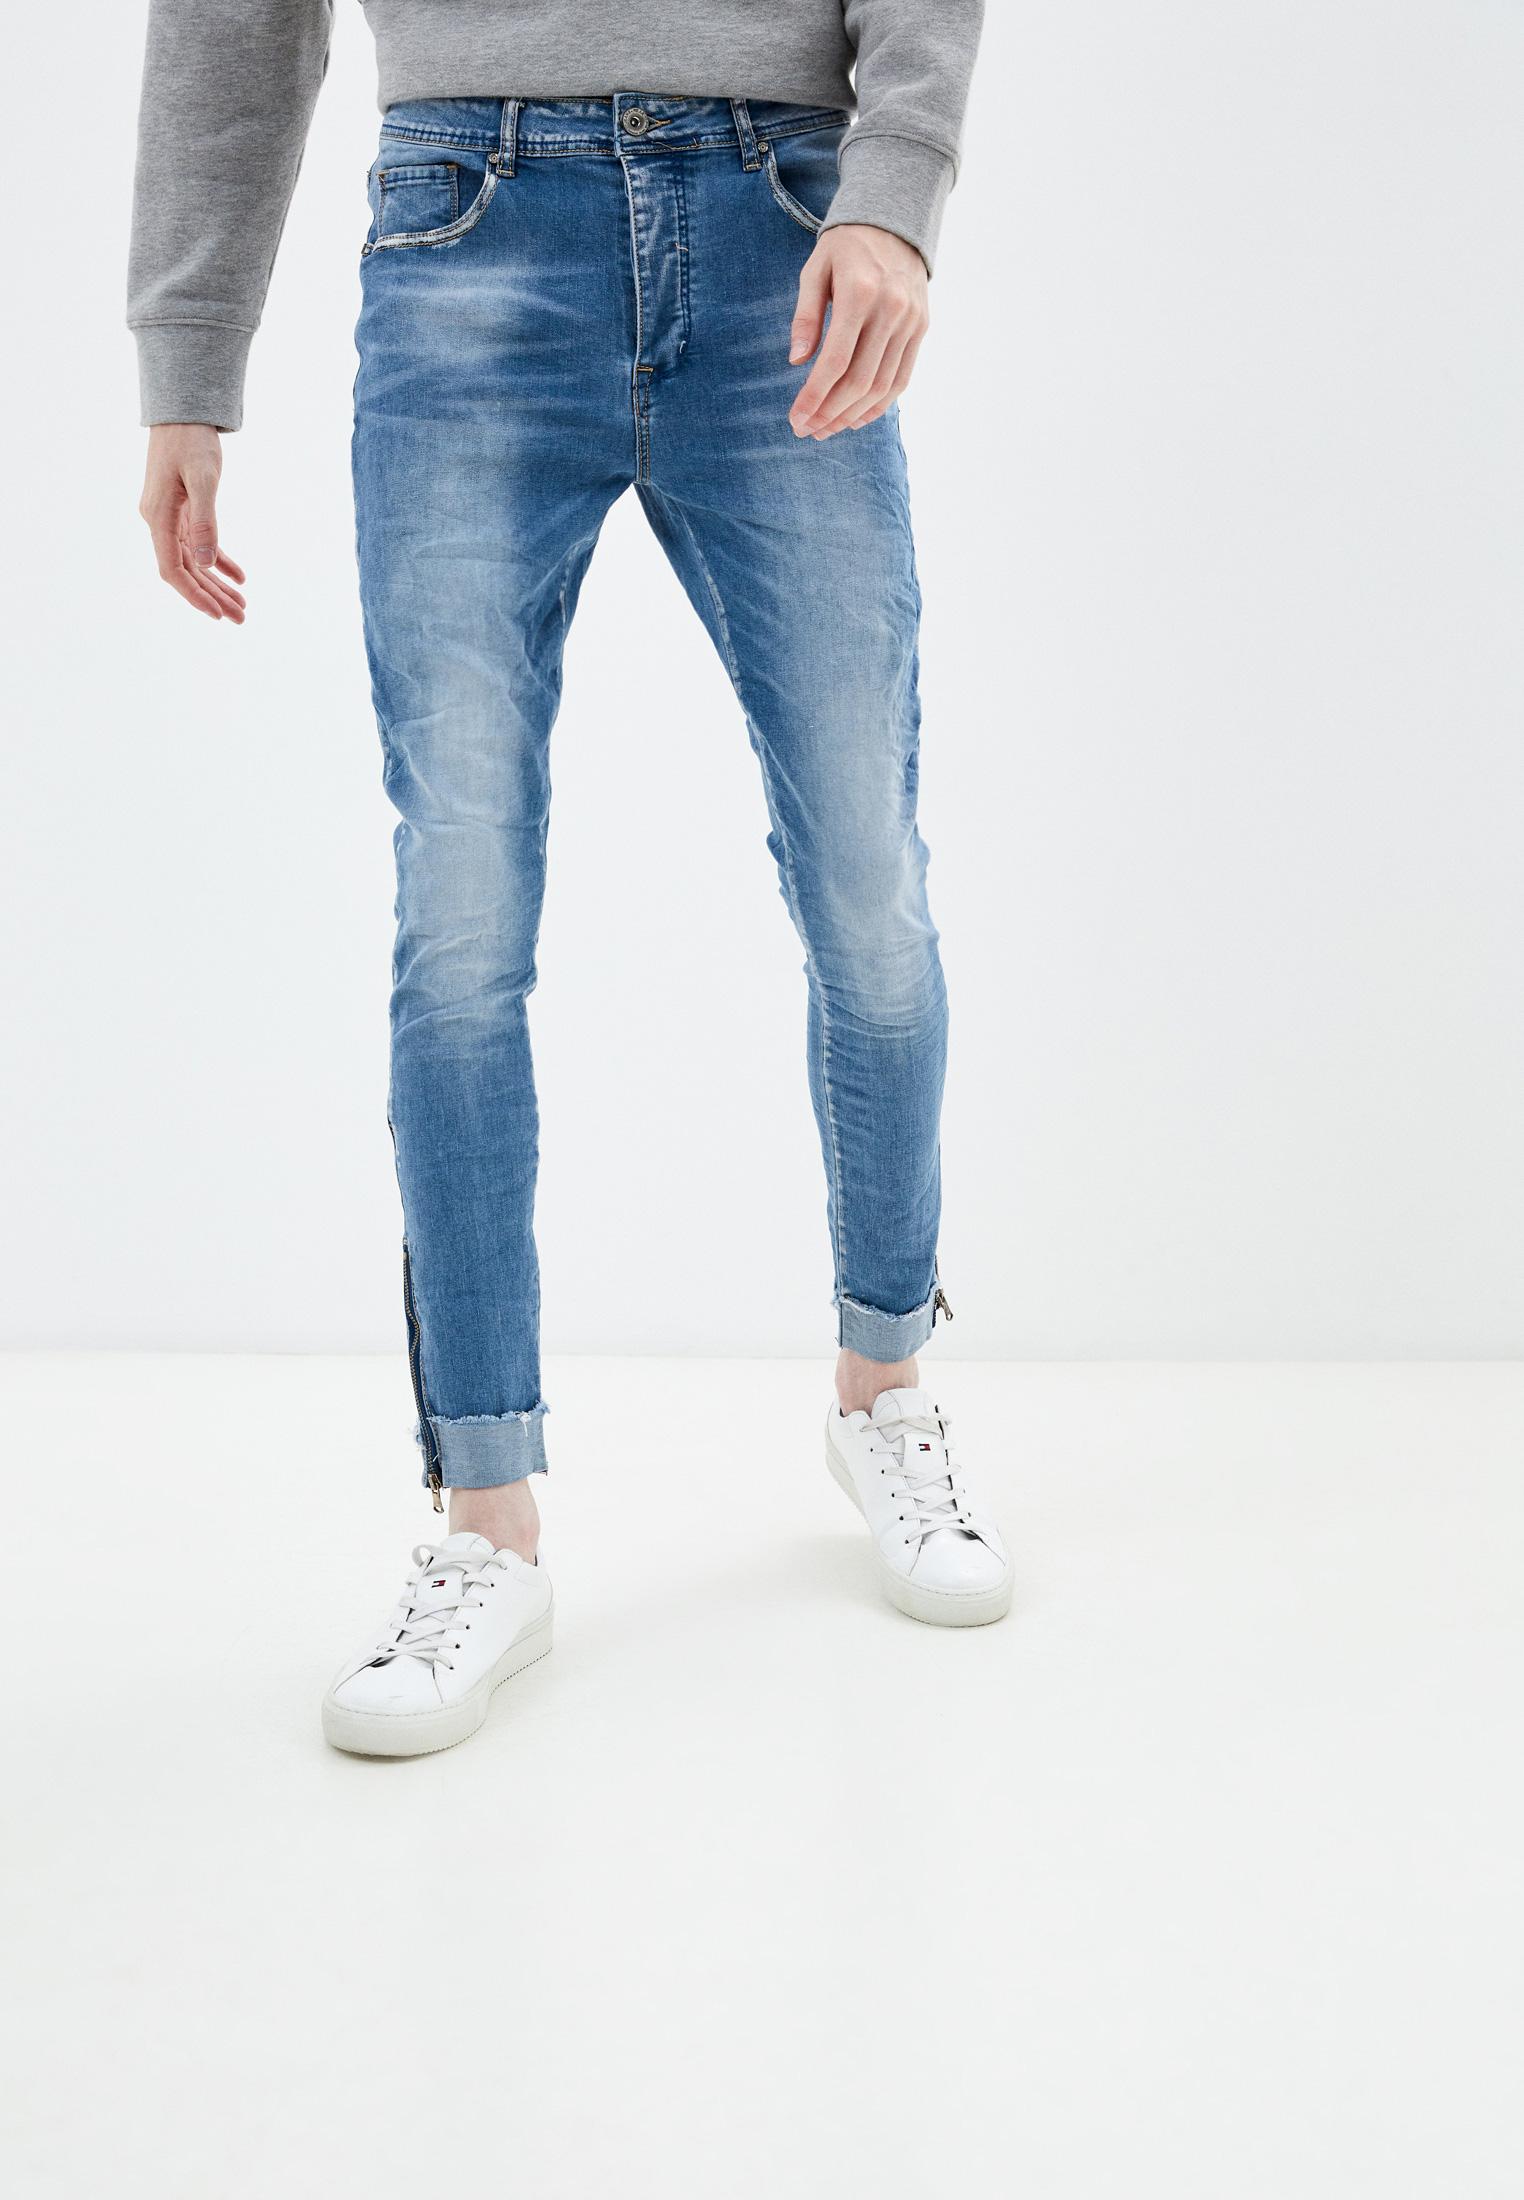 Зауженные джинсы Terance Kole 66032